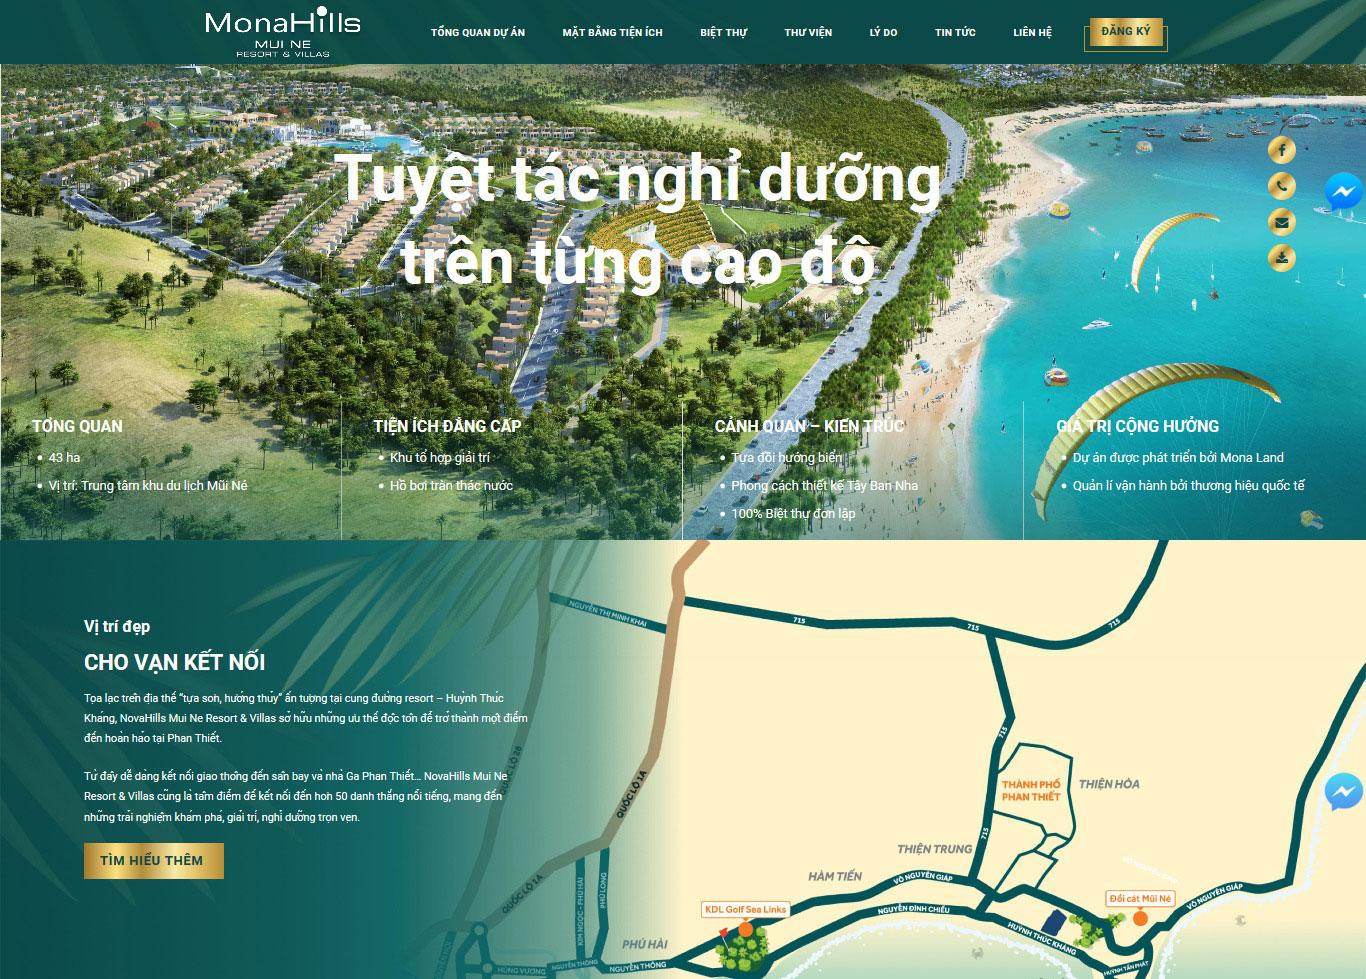 Mẫu website bất động sản MonaHills